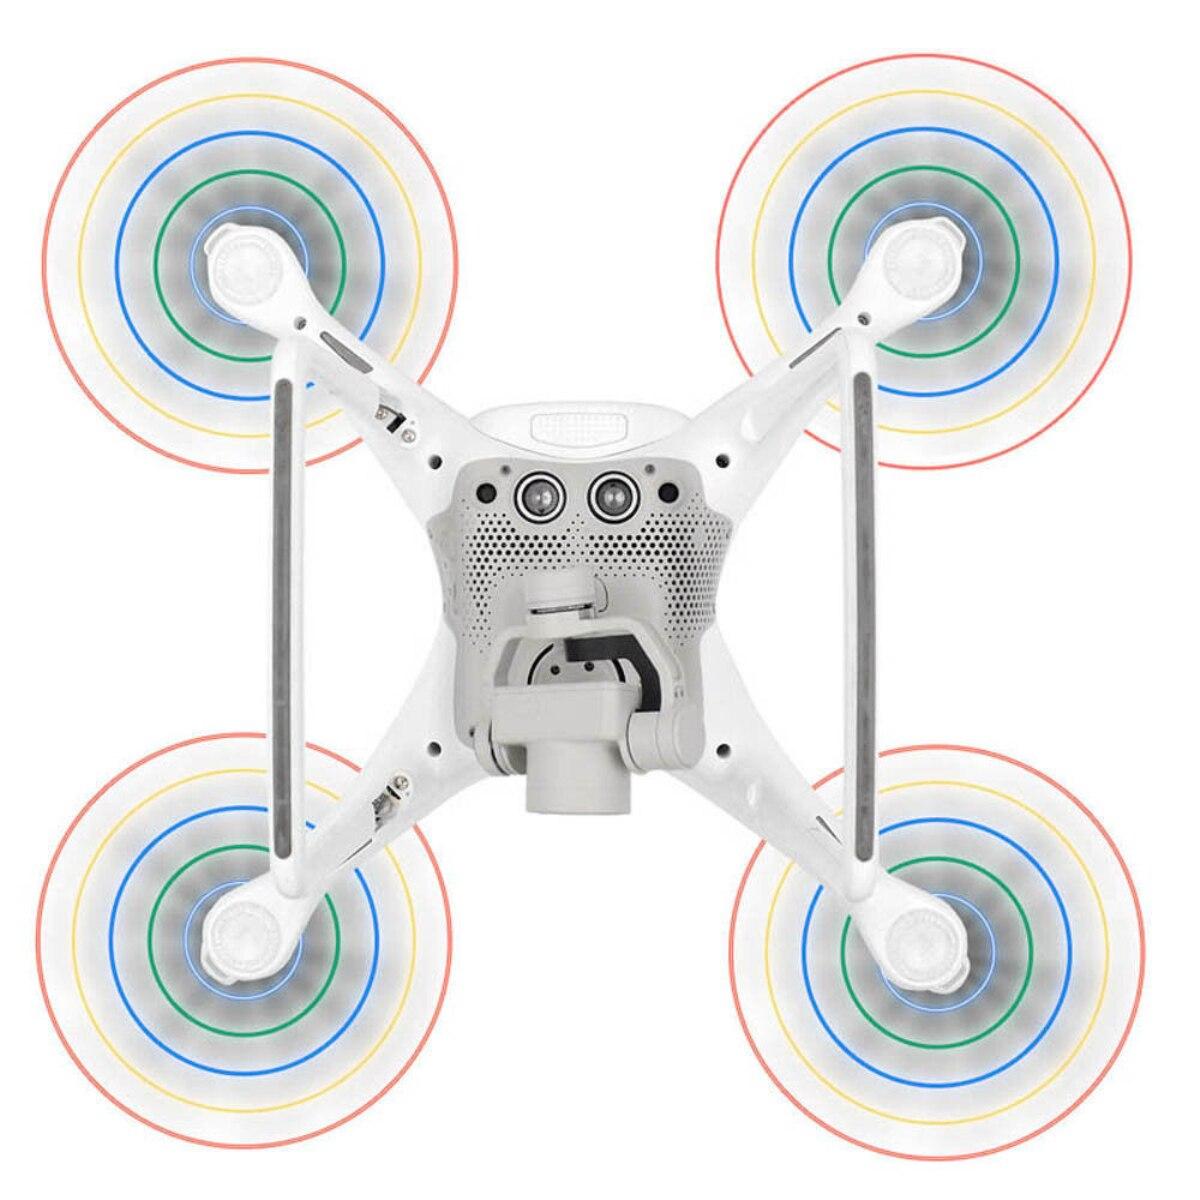 2PCS 1 Pair LED Light Flash Propeller USB Charging For DJI Phantom 4 Pro Camera Drones Accessories Night Flying Fun